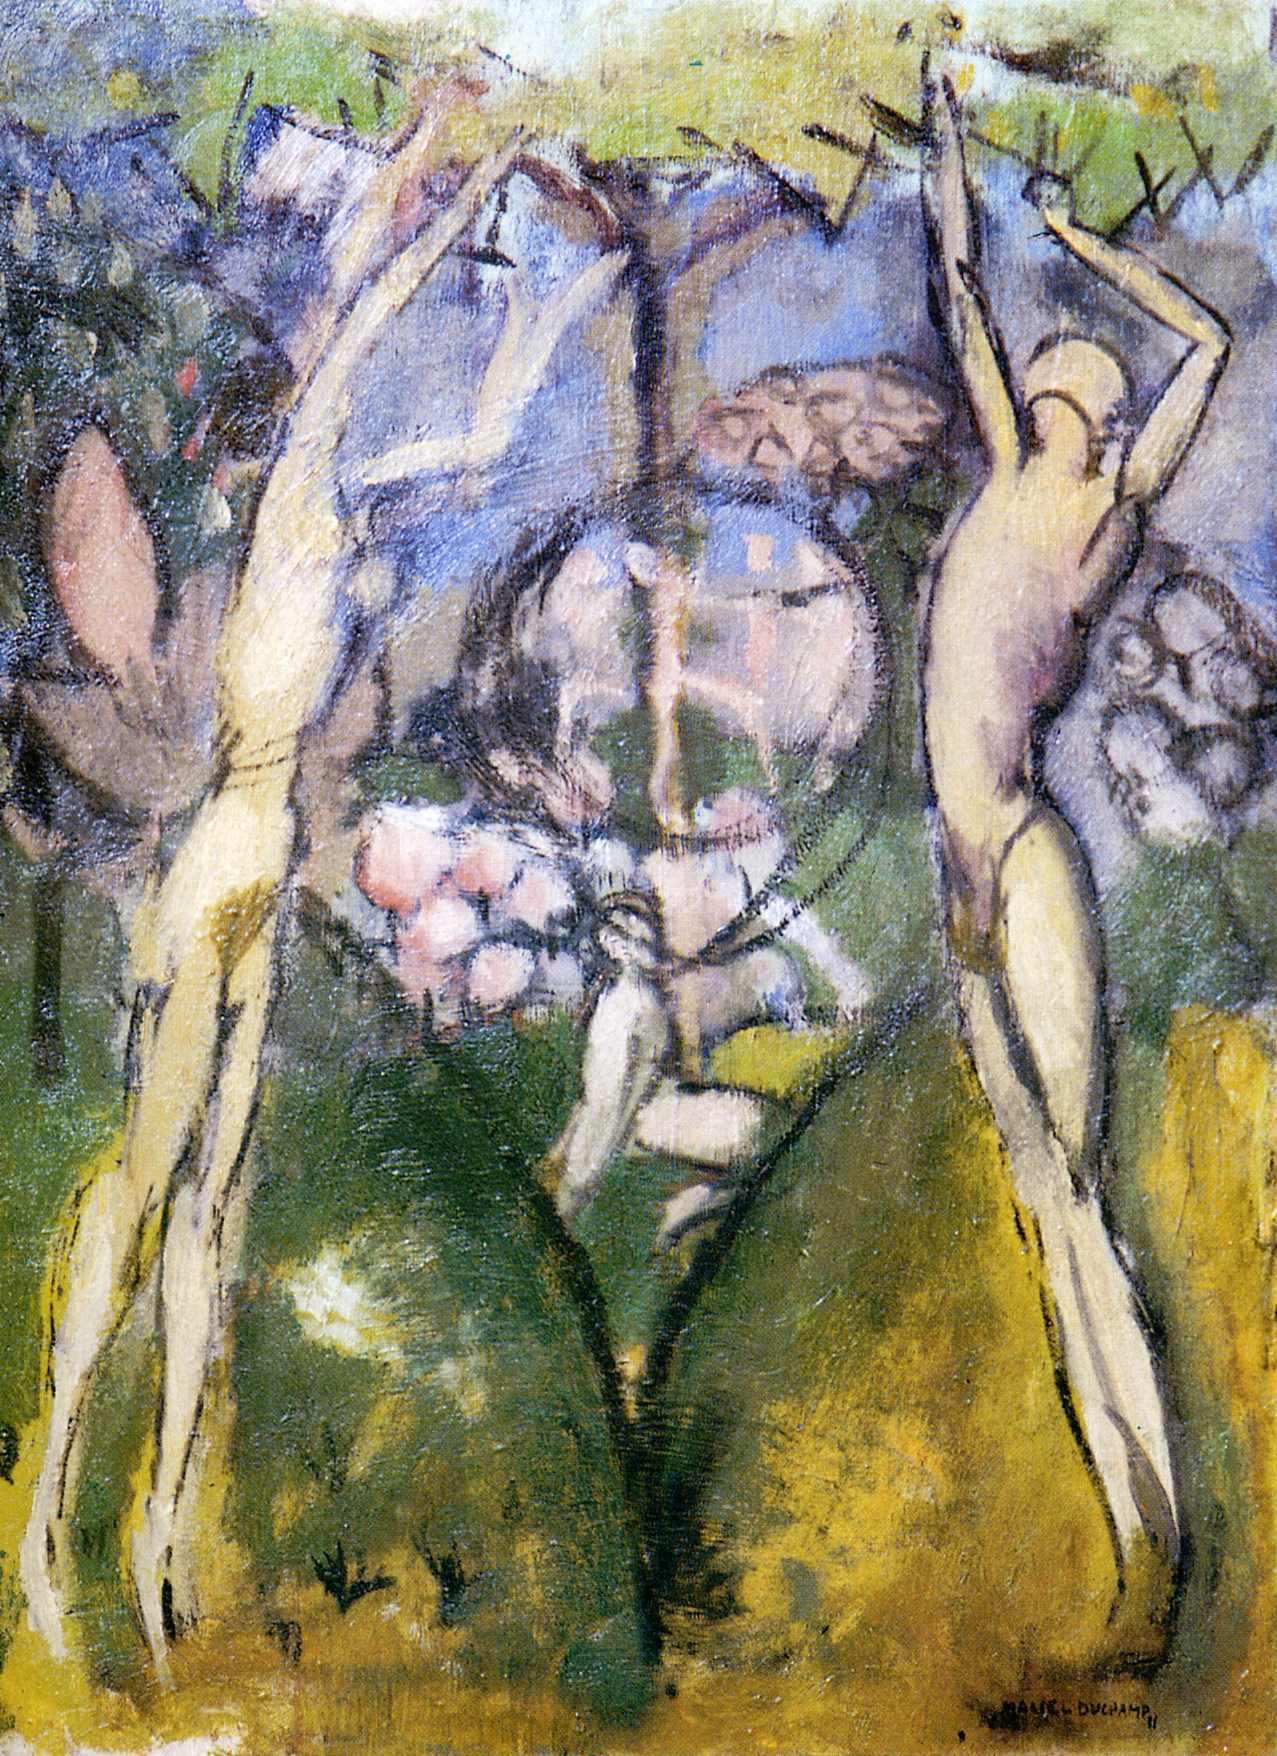 Duchamp Painting On Glass